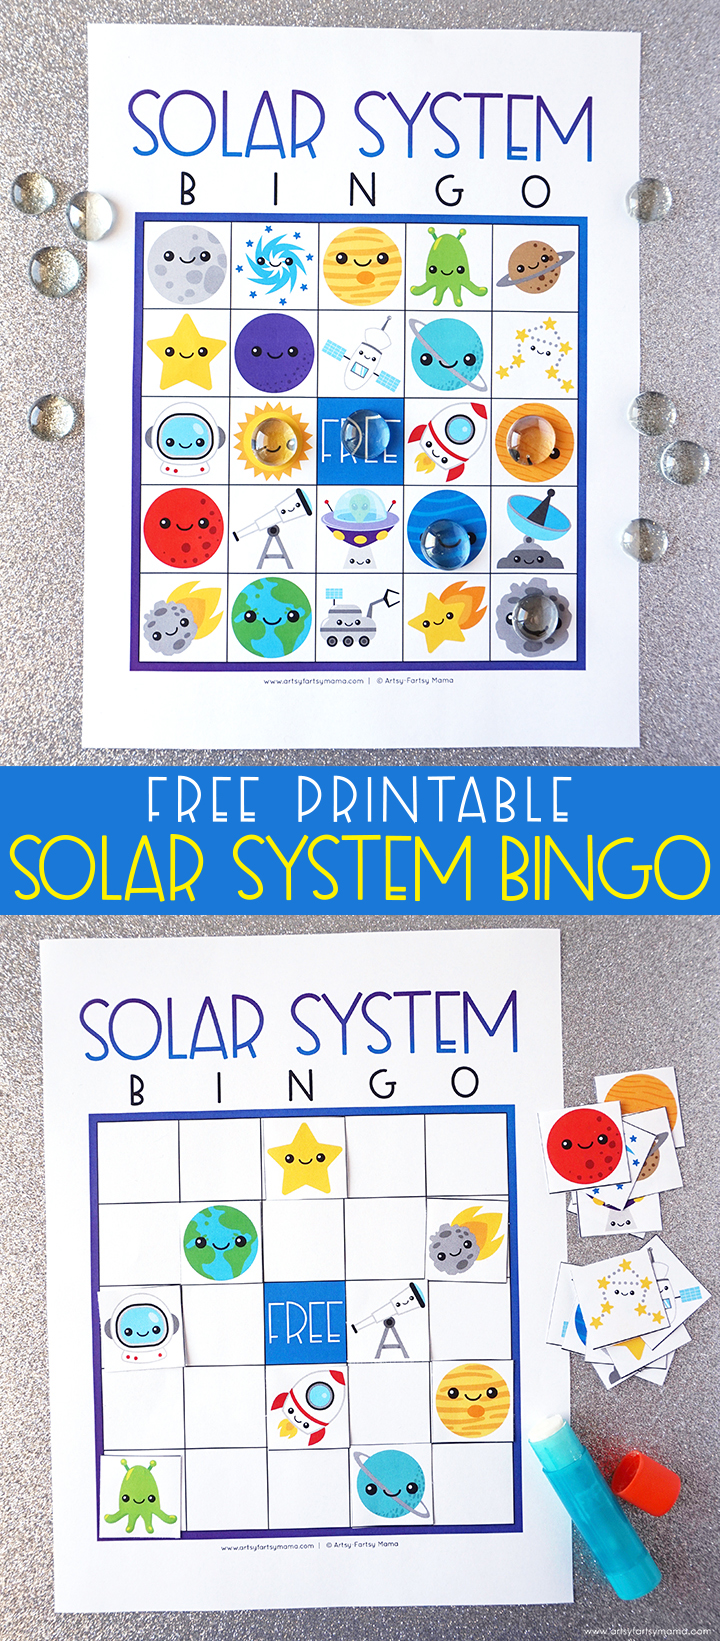 Free Printable Solar System Bingo